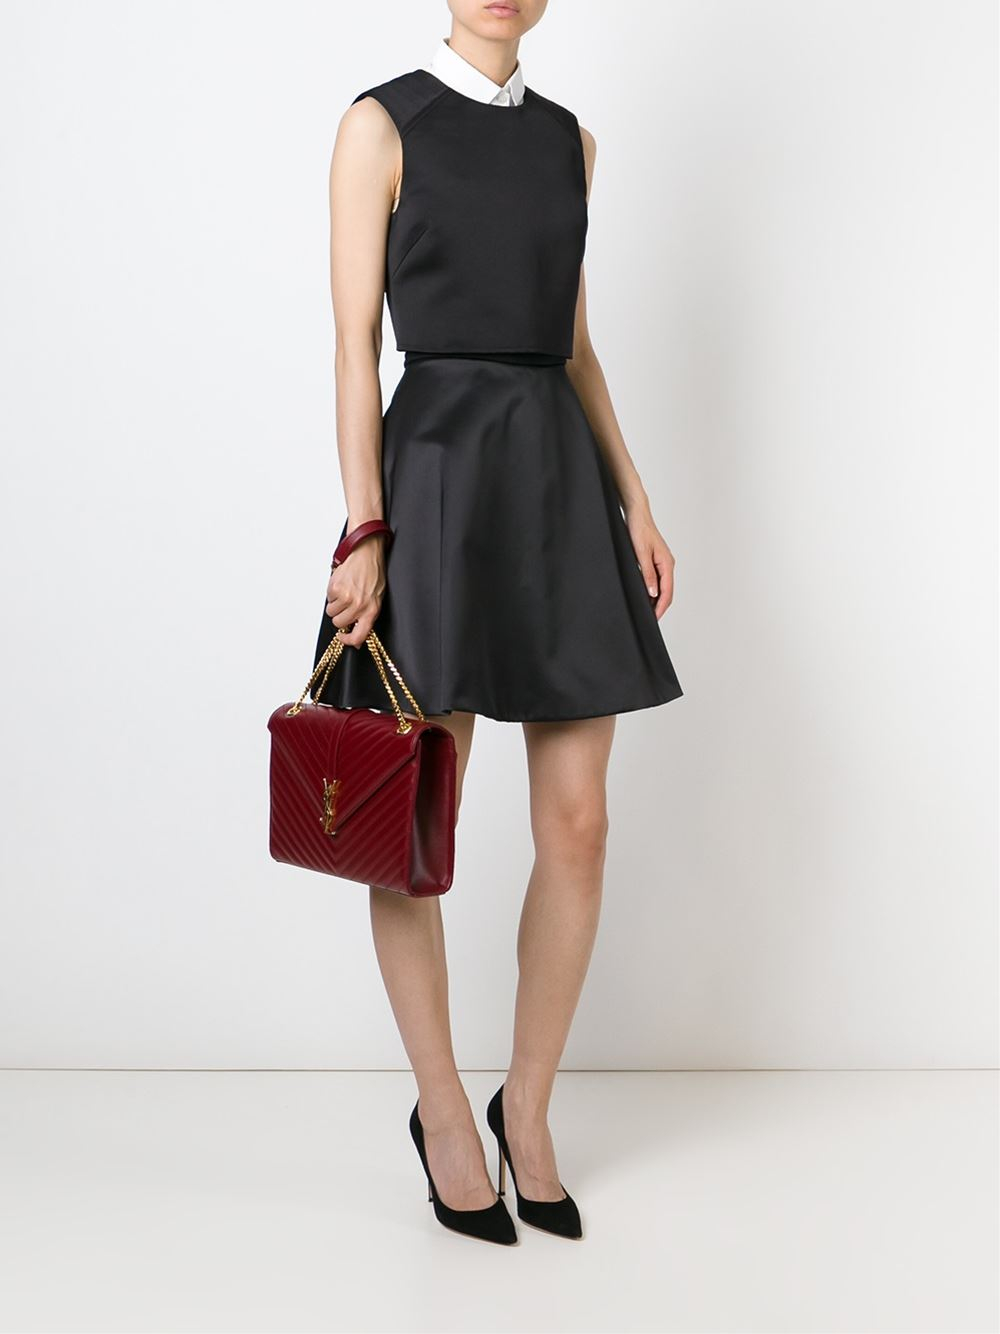 ysl satchel bag - classic medium monogram saint laurent chain bag in black matelasse ...